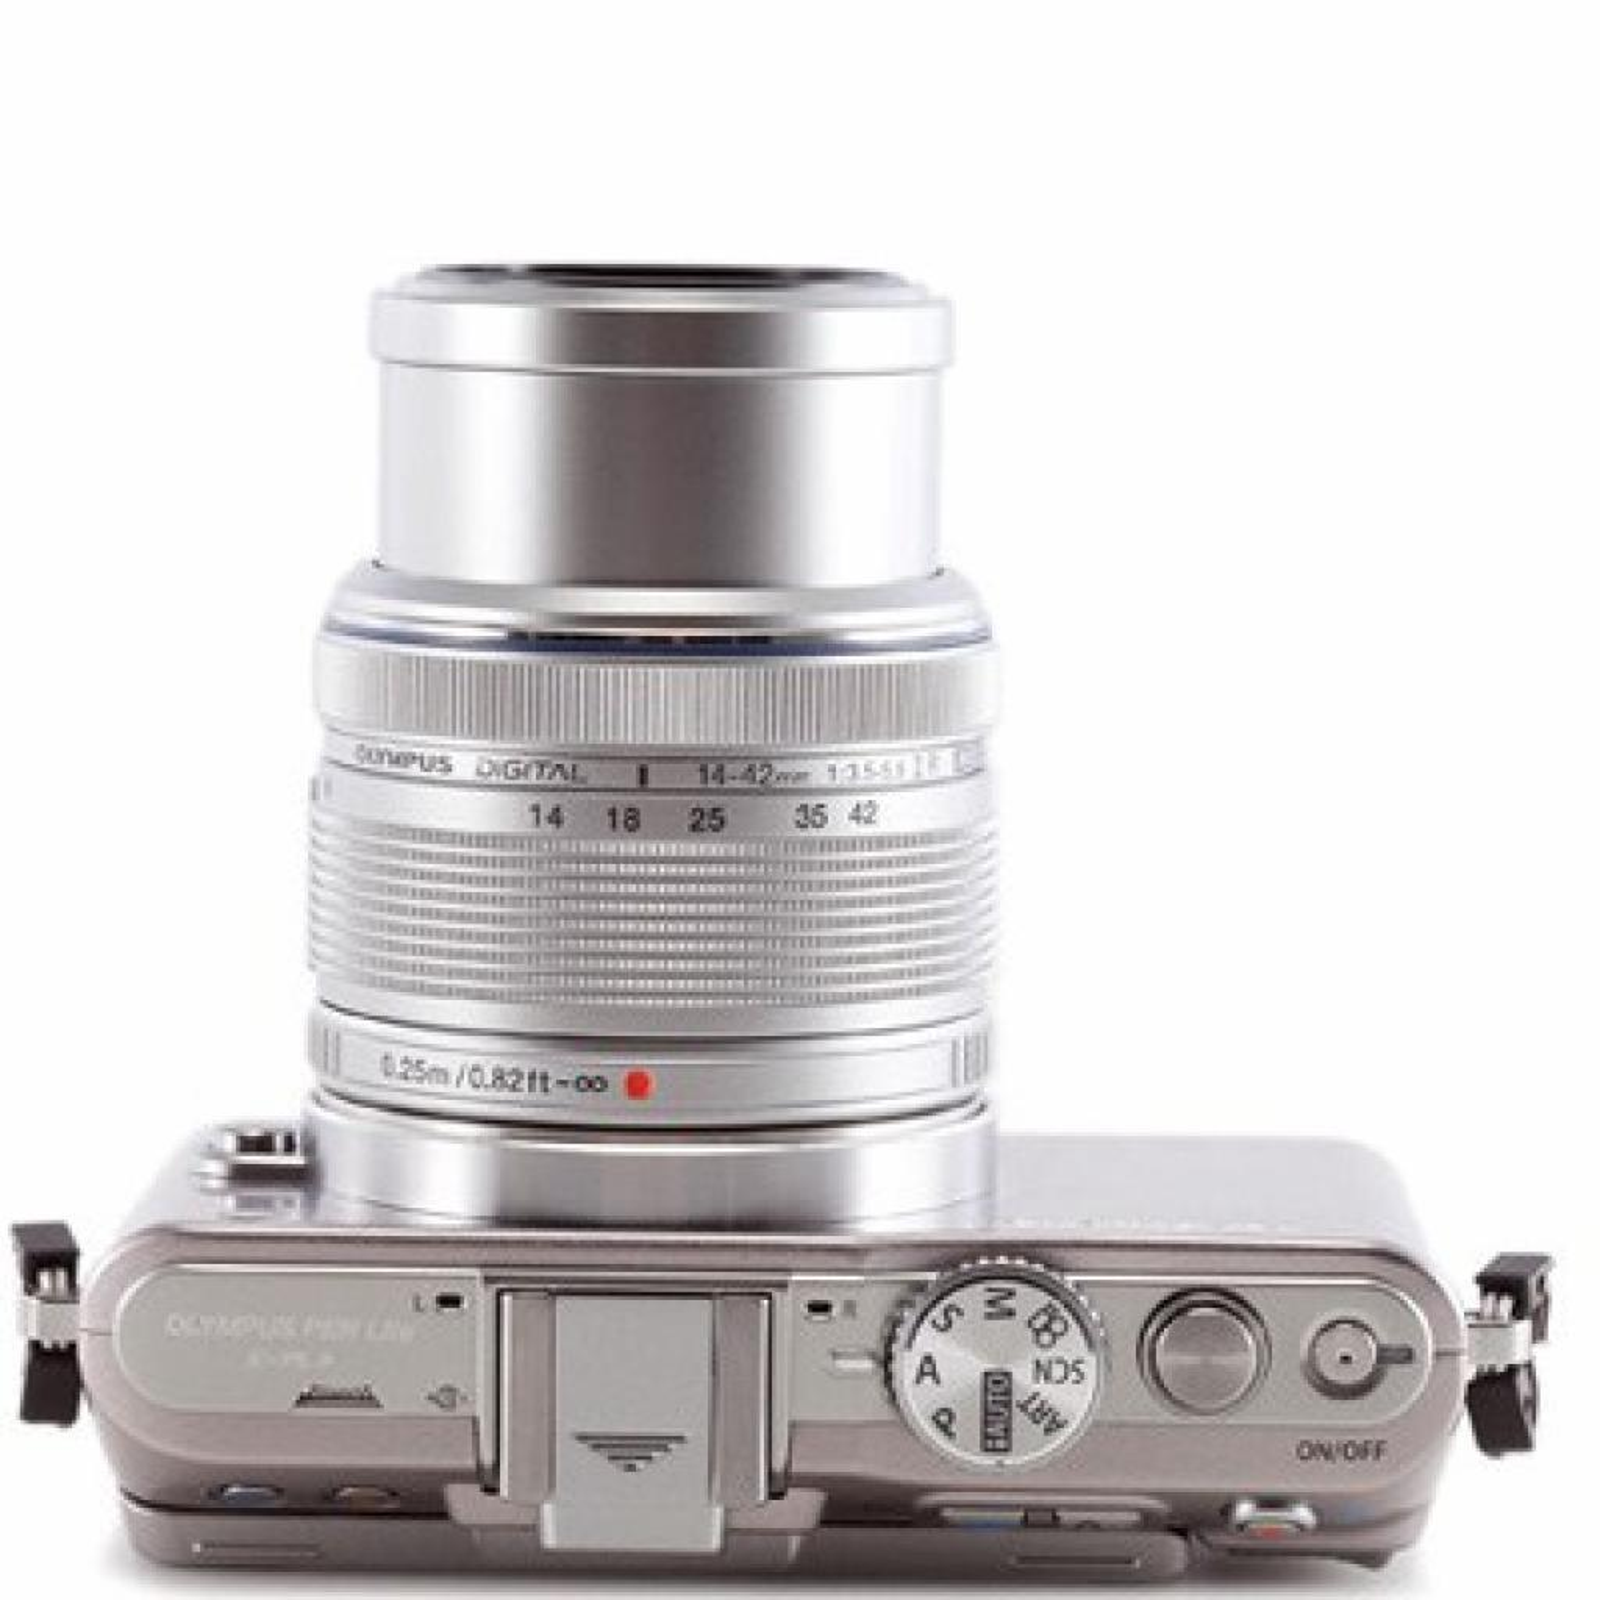 Цифровой фотоаппарат OLYMPUS PEN E-PL3 14-42 mm kit silver/silver (V20503BSE000/V205031SE000) изображение 3